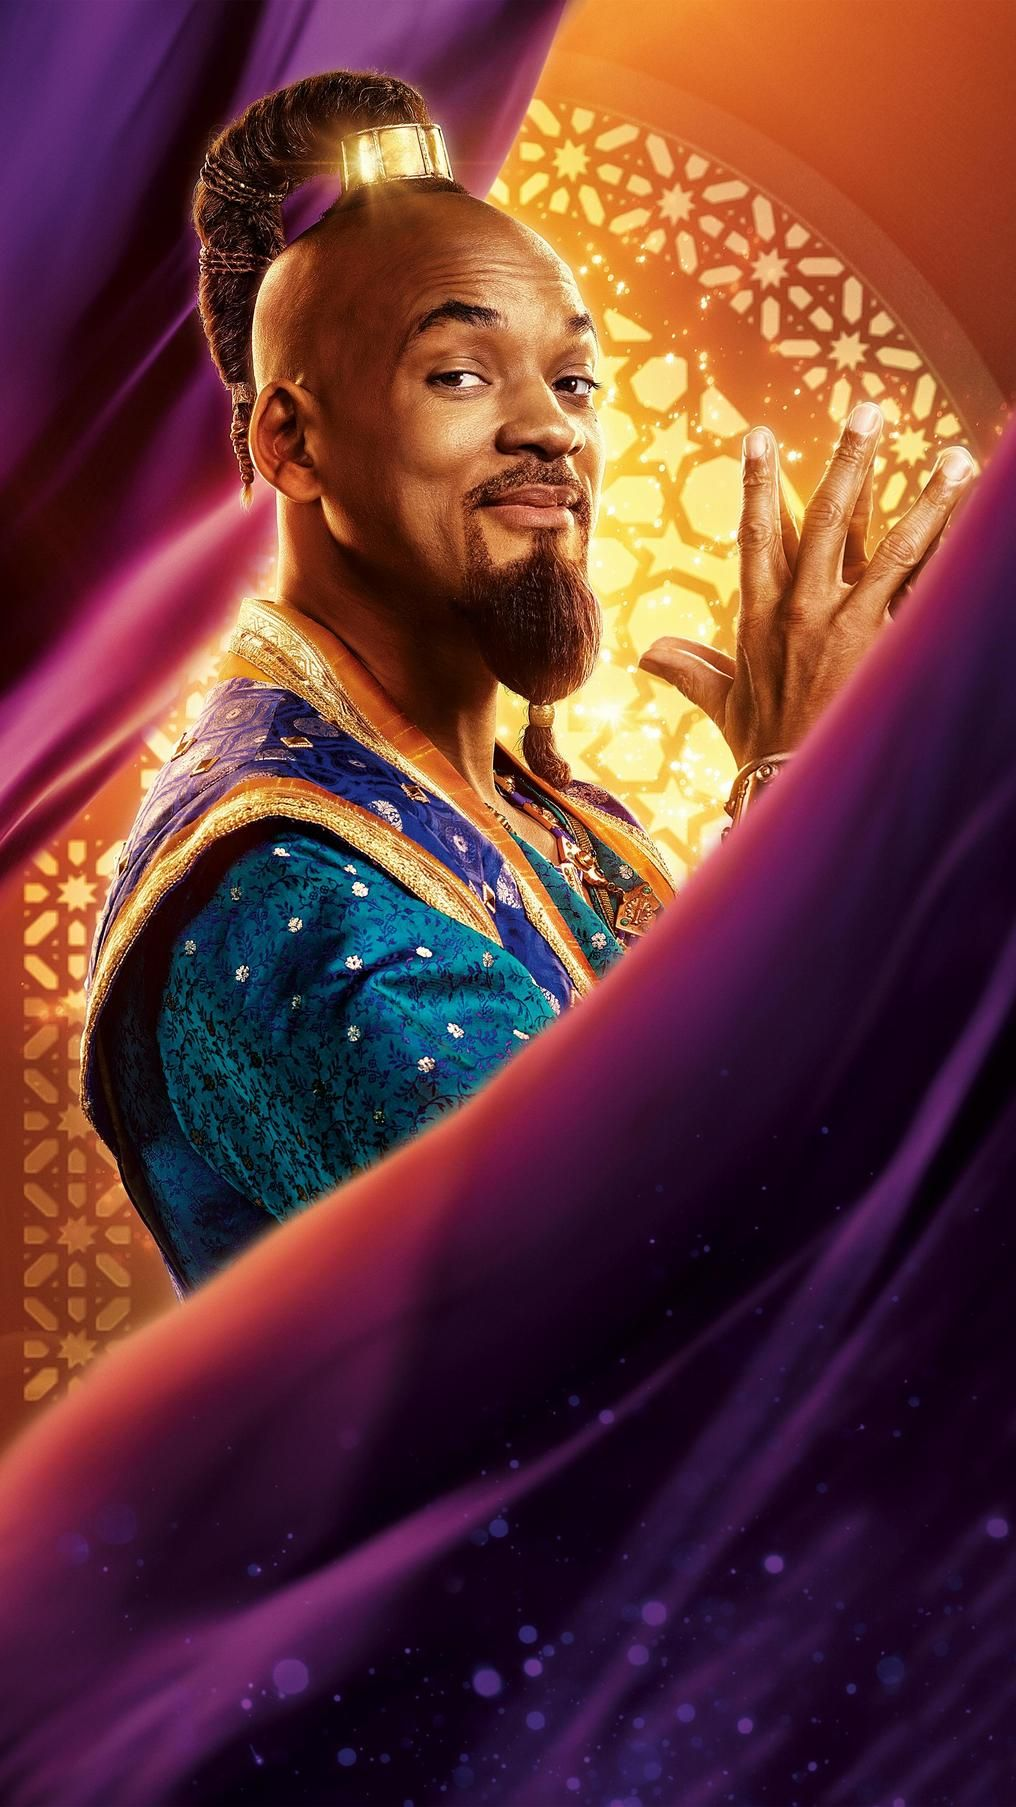 Aladdin 2019 Phone Wallpaper アラジン ディズニー ディズニー